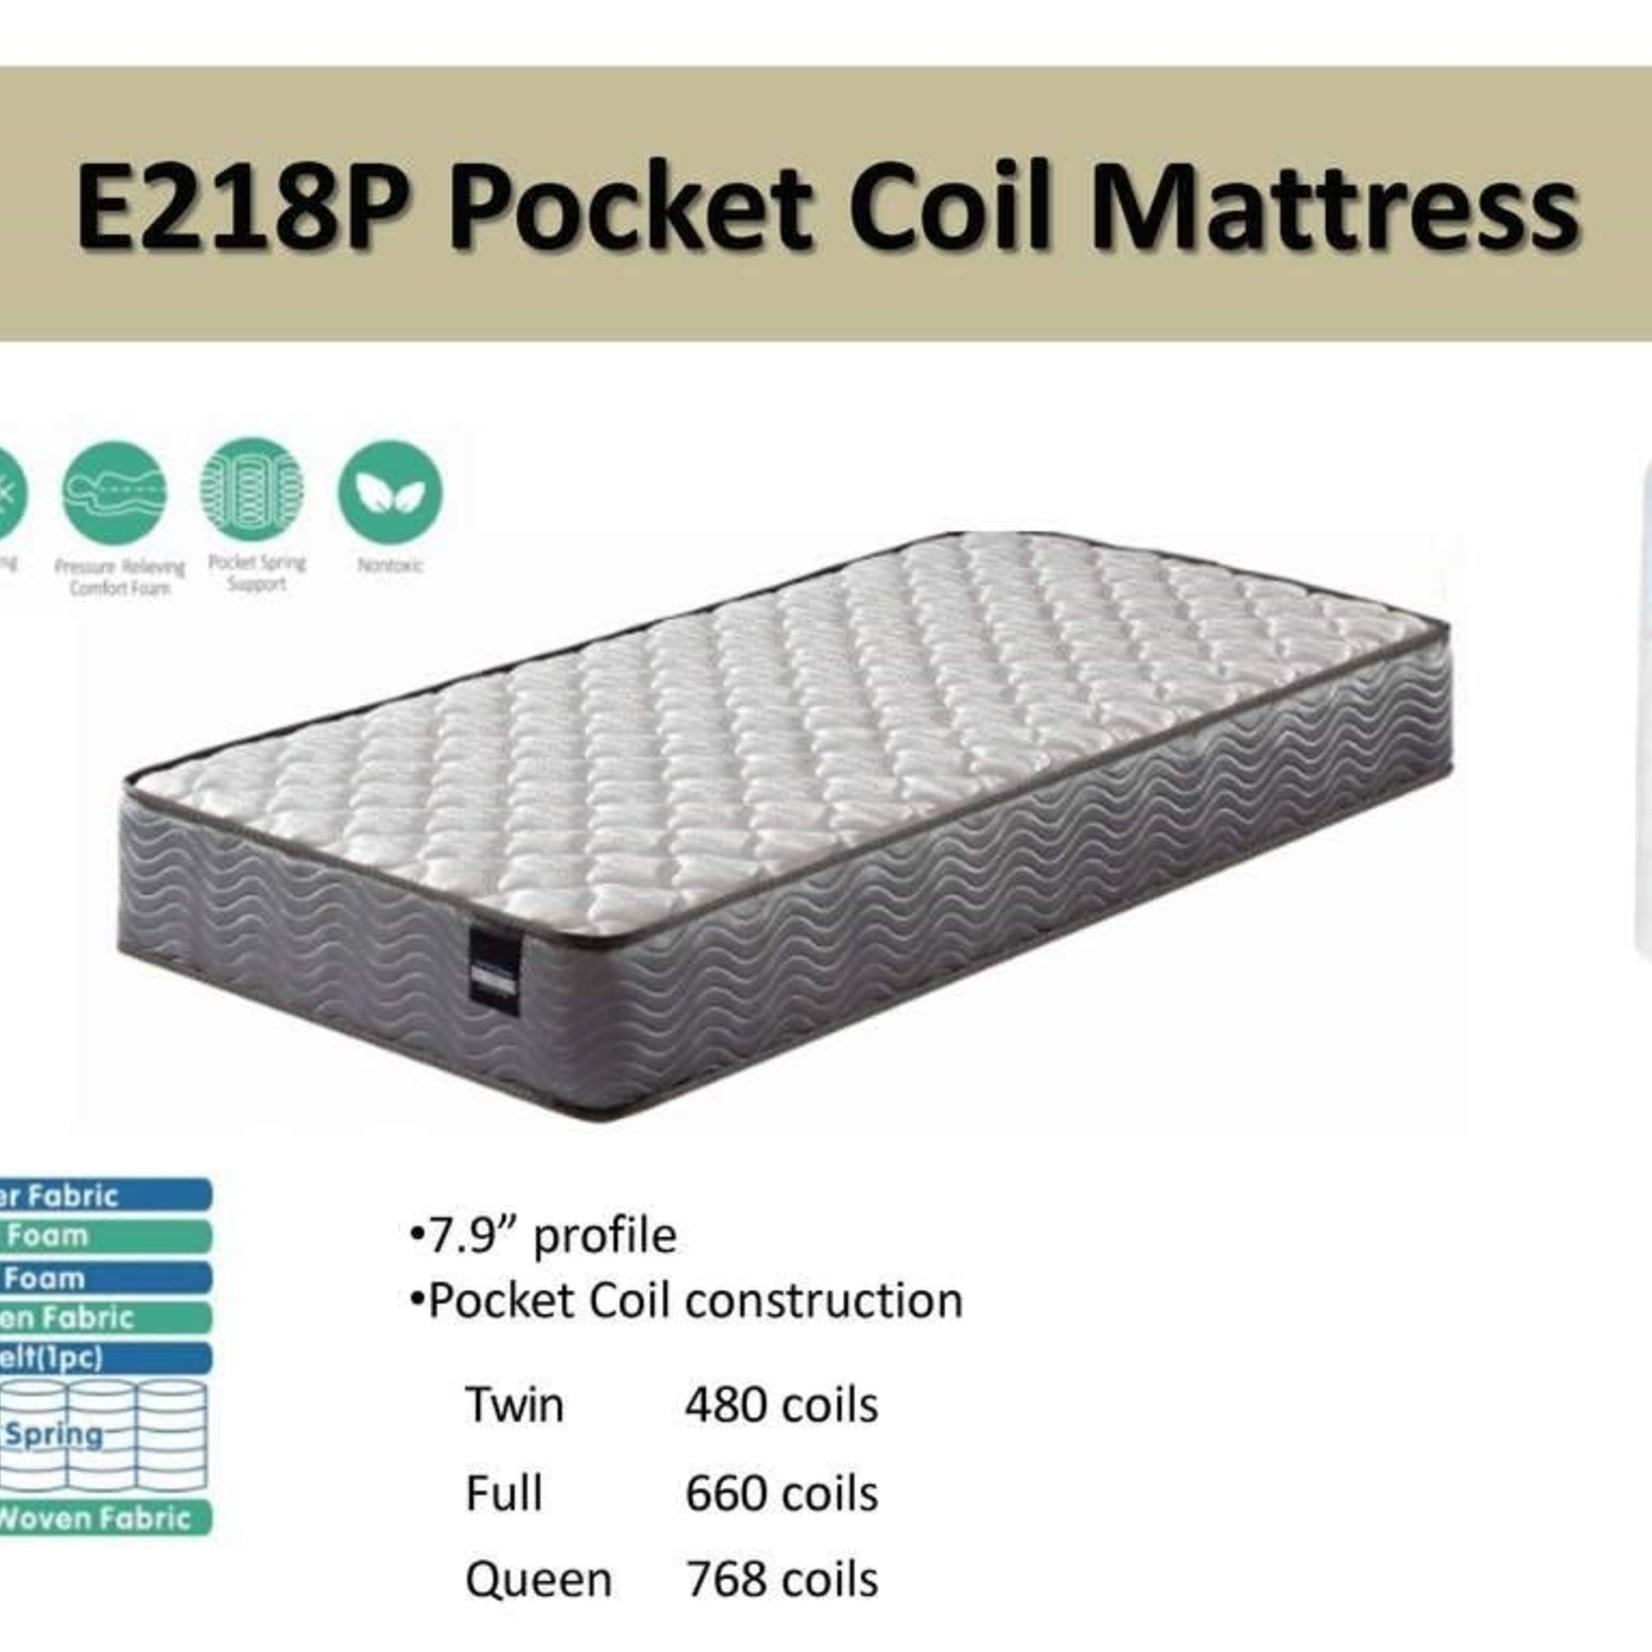 E218P Pocket Coil Double Mattress